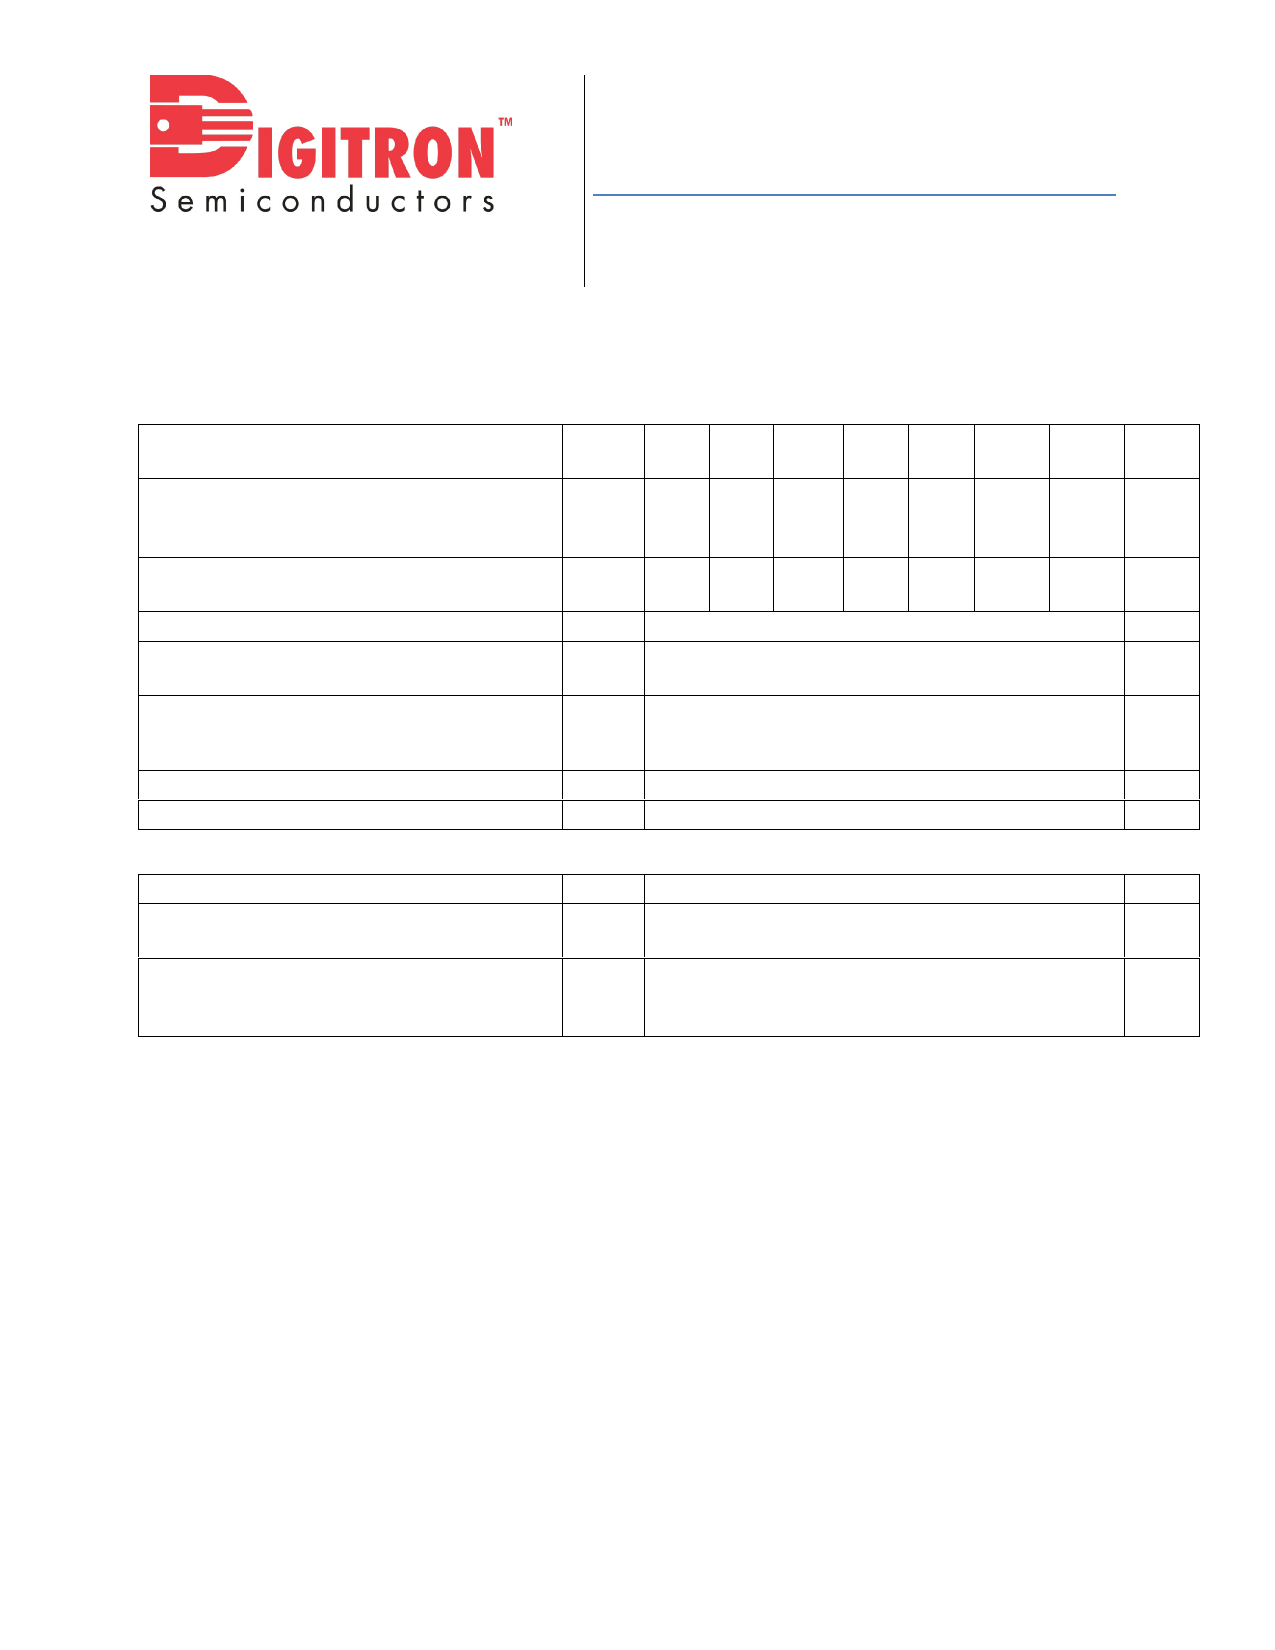 MR2010 데이터시트 및 MR2010 PDF